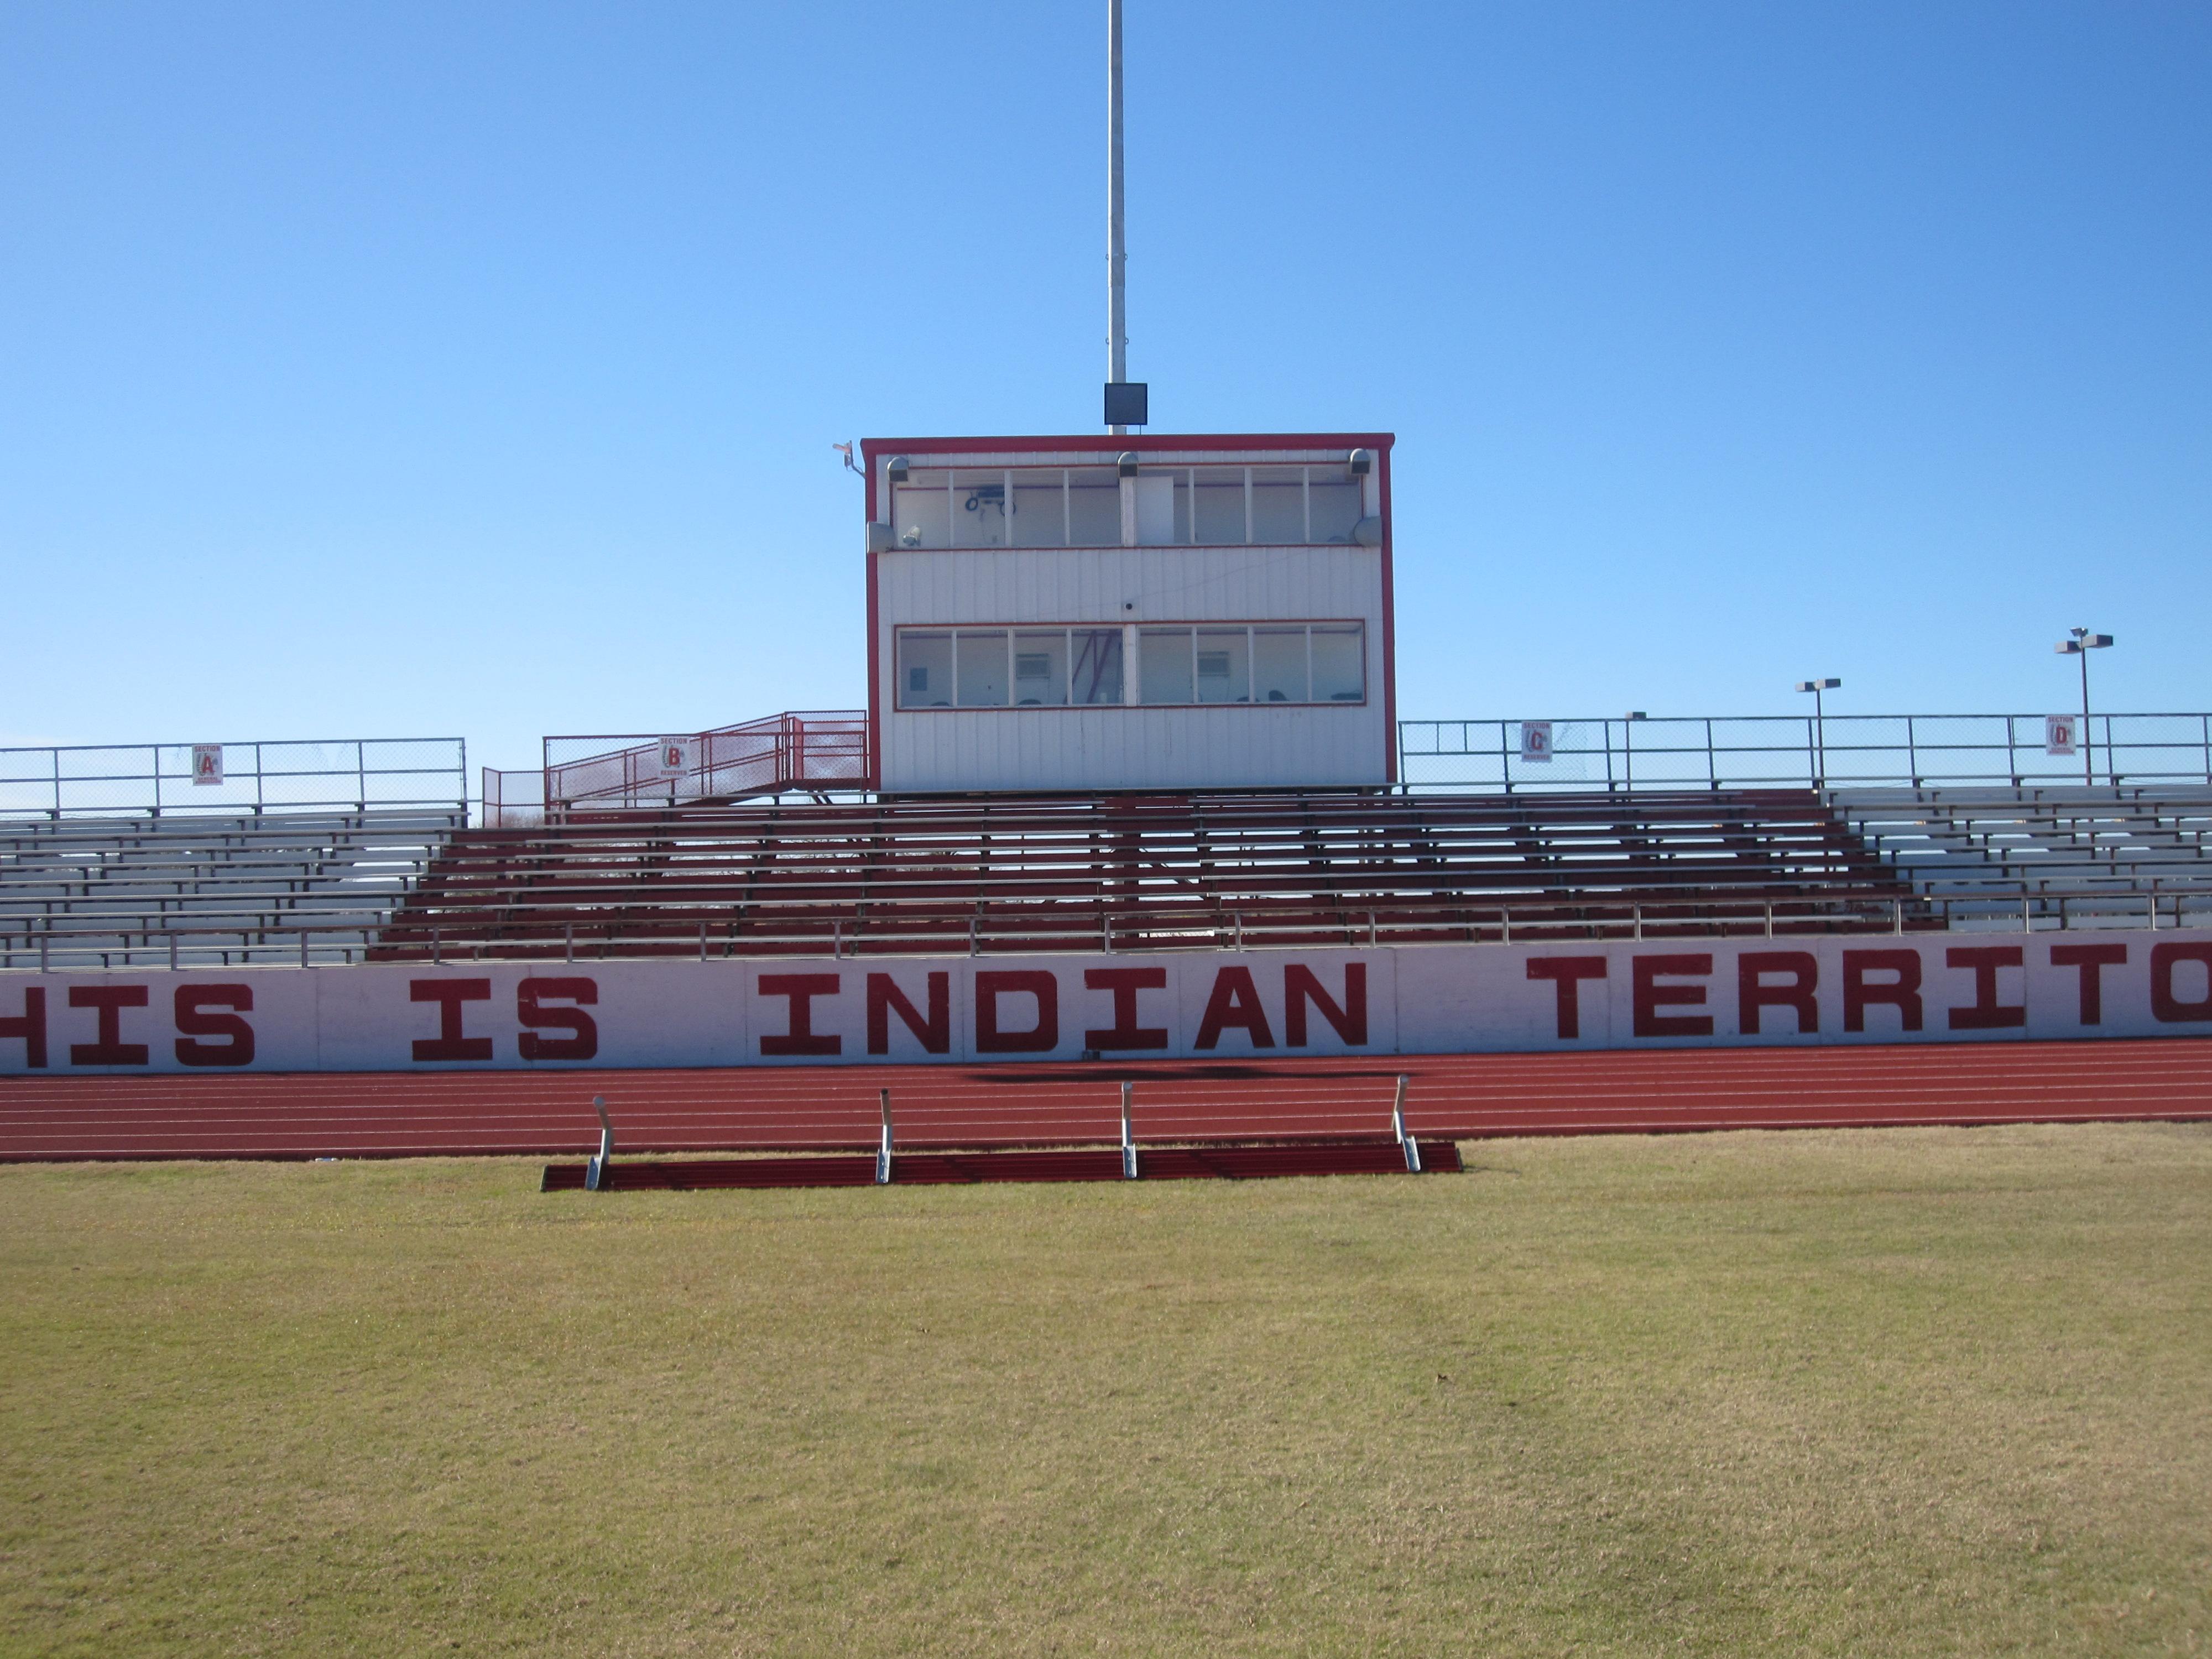 File:Indian Stadium in Jourdanton, TX IMG 2573.JPG